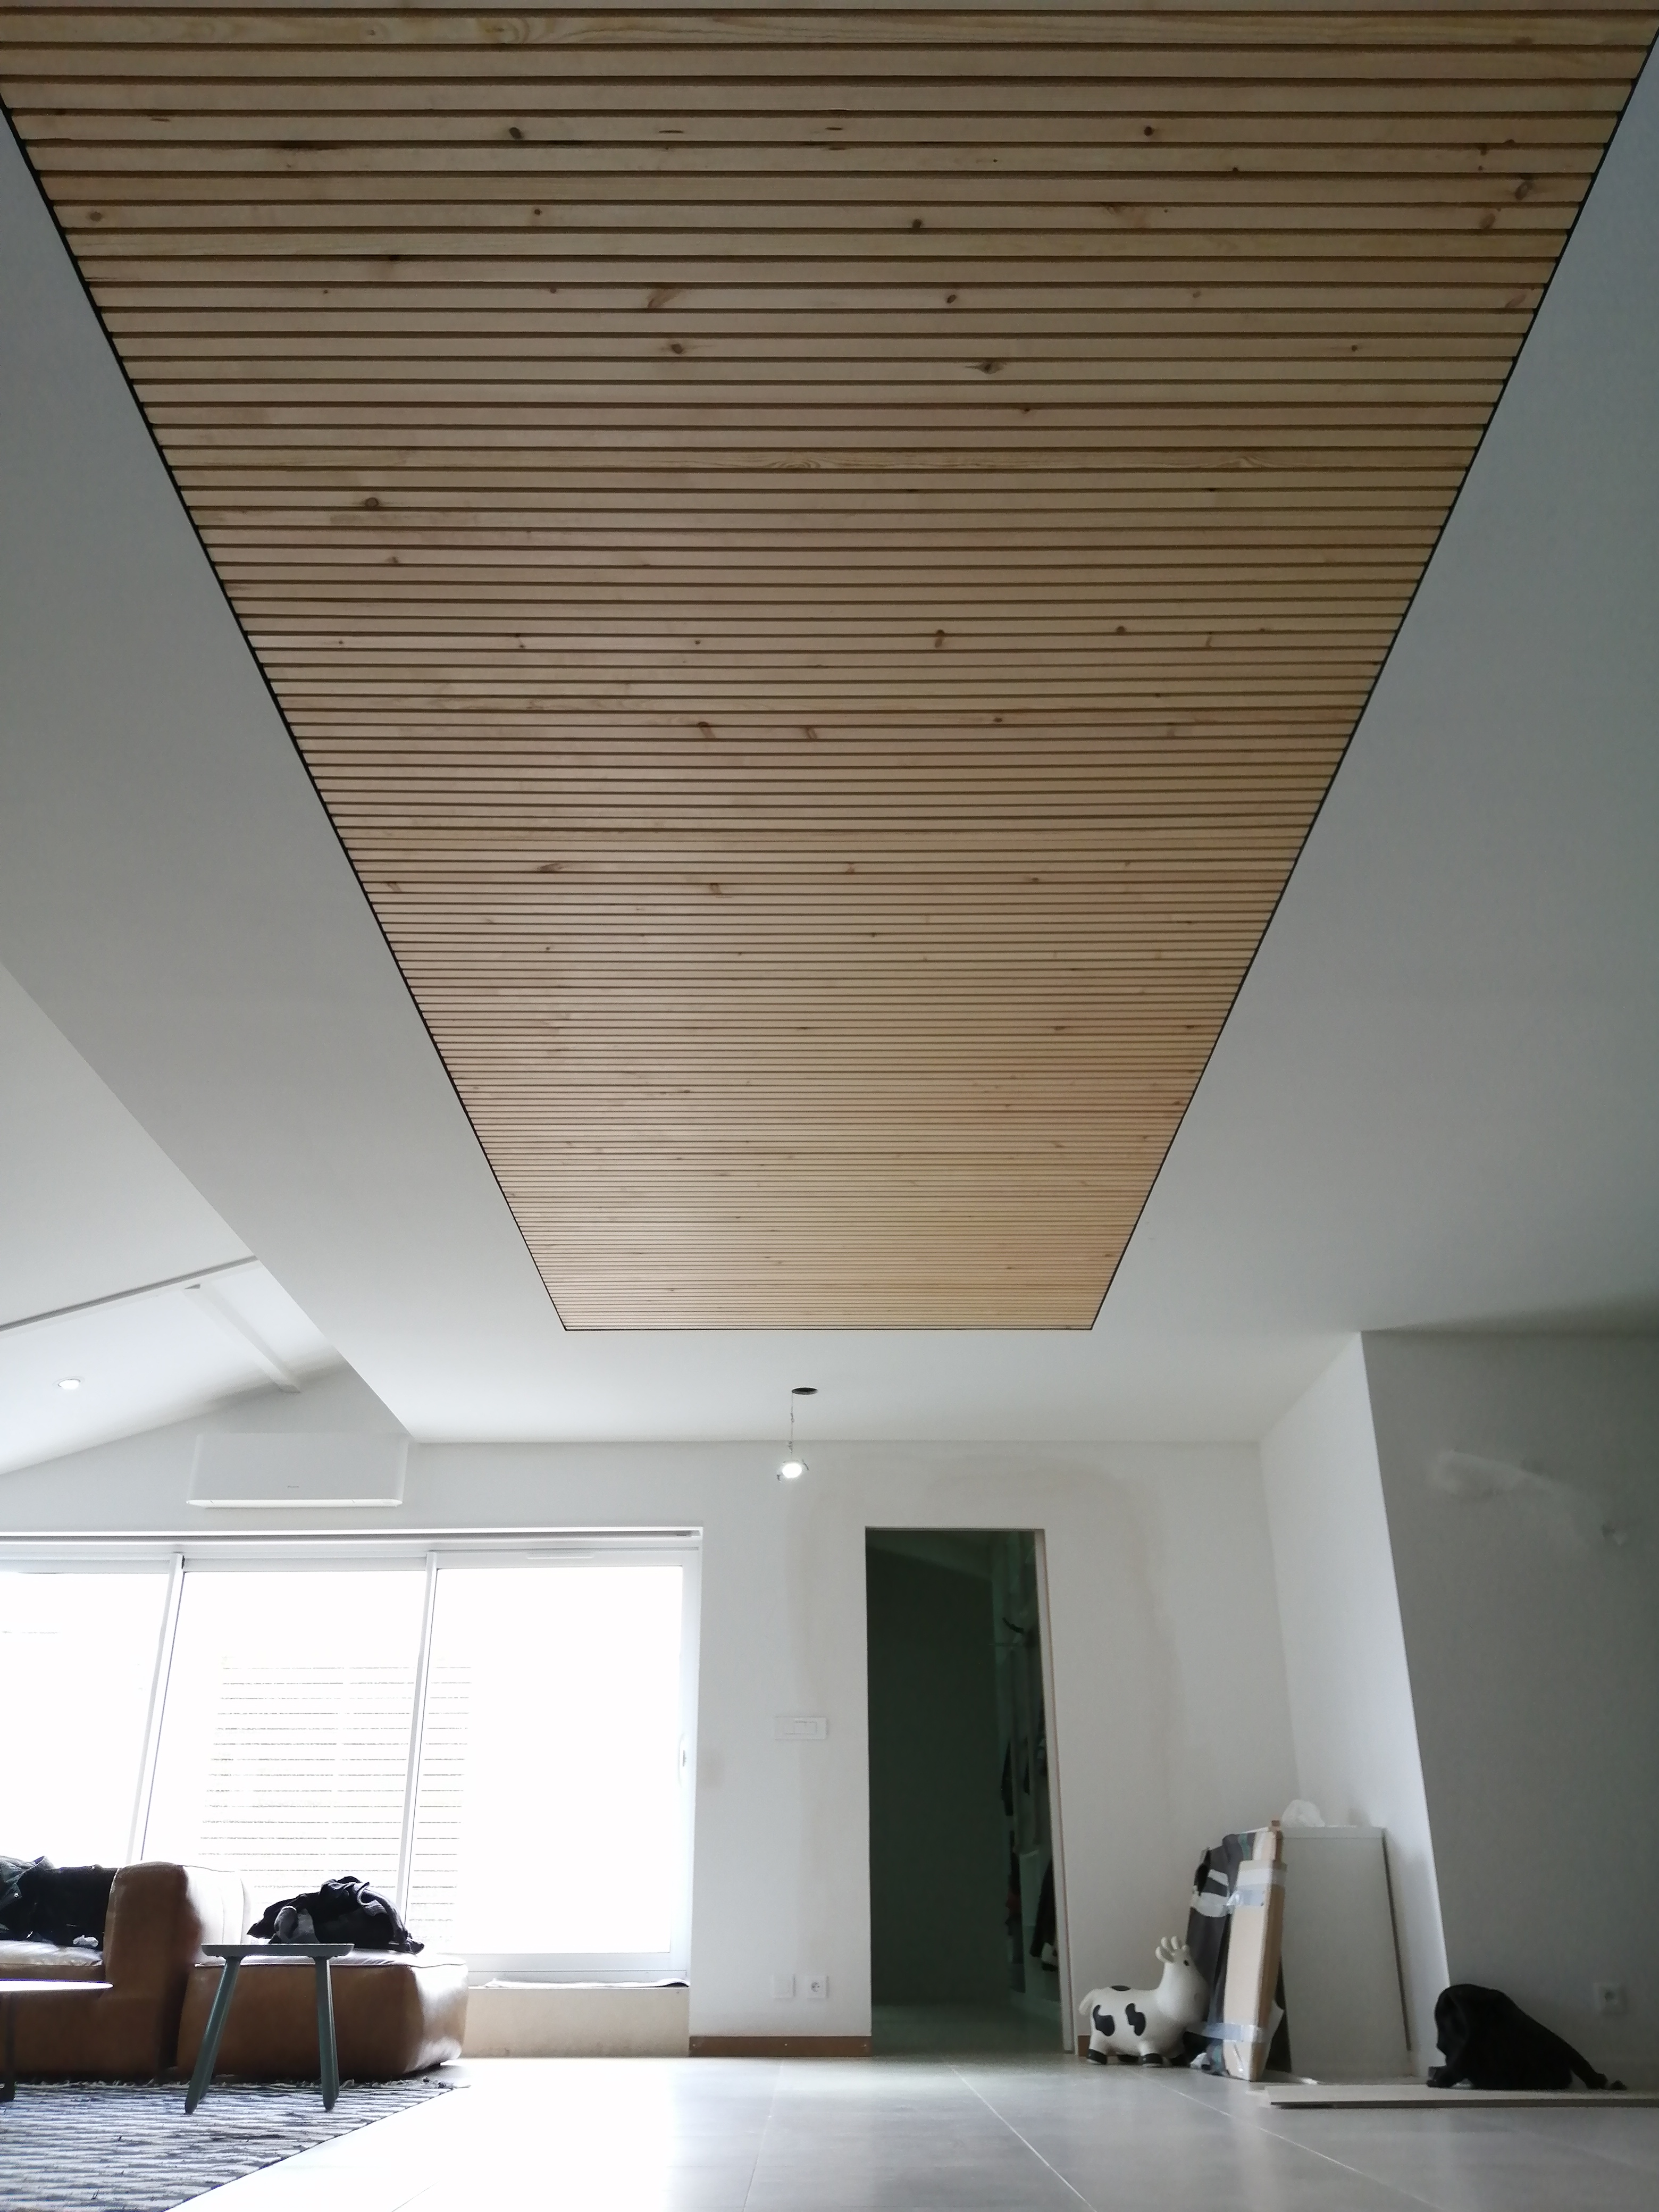 Habillage d'un plafond place Puy Paulin